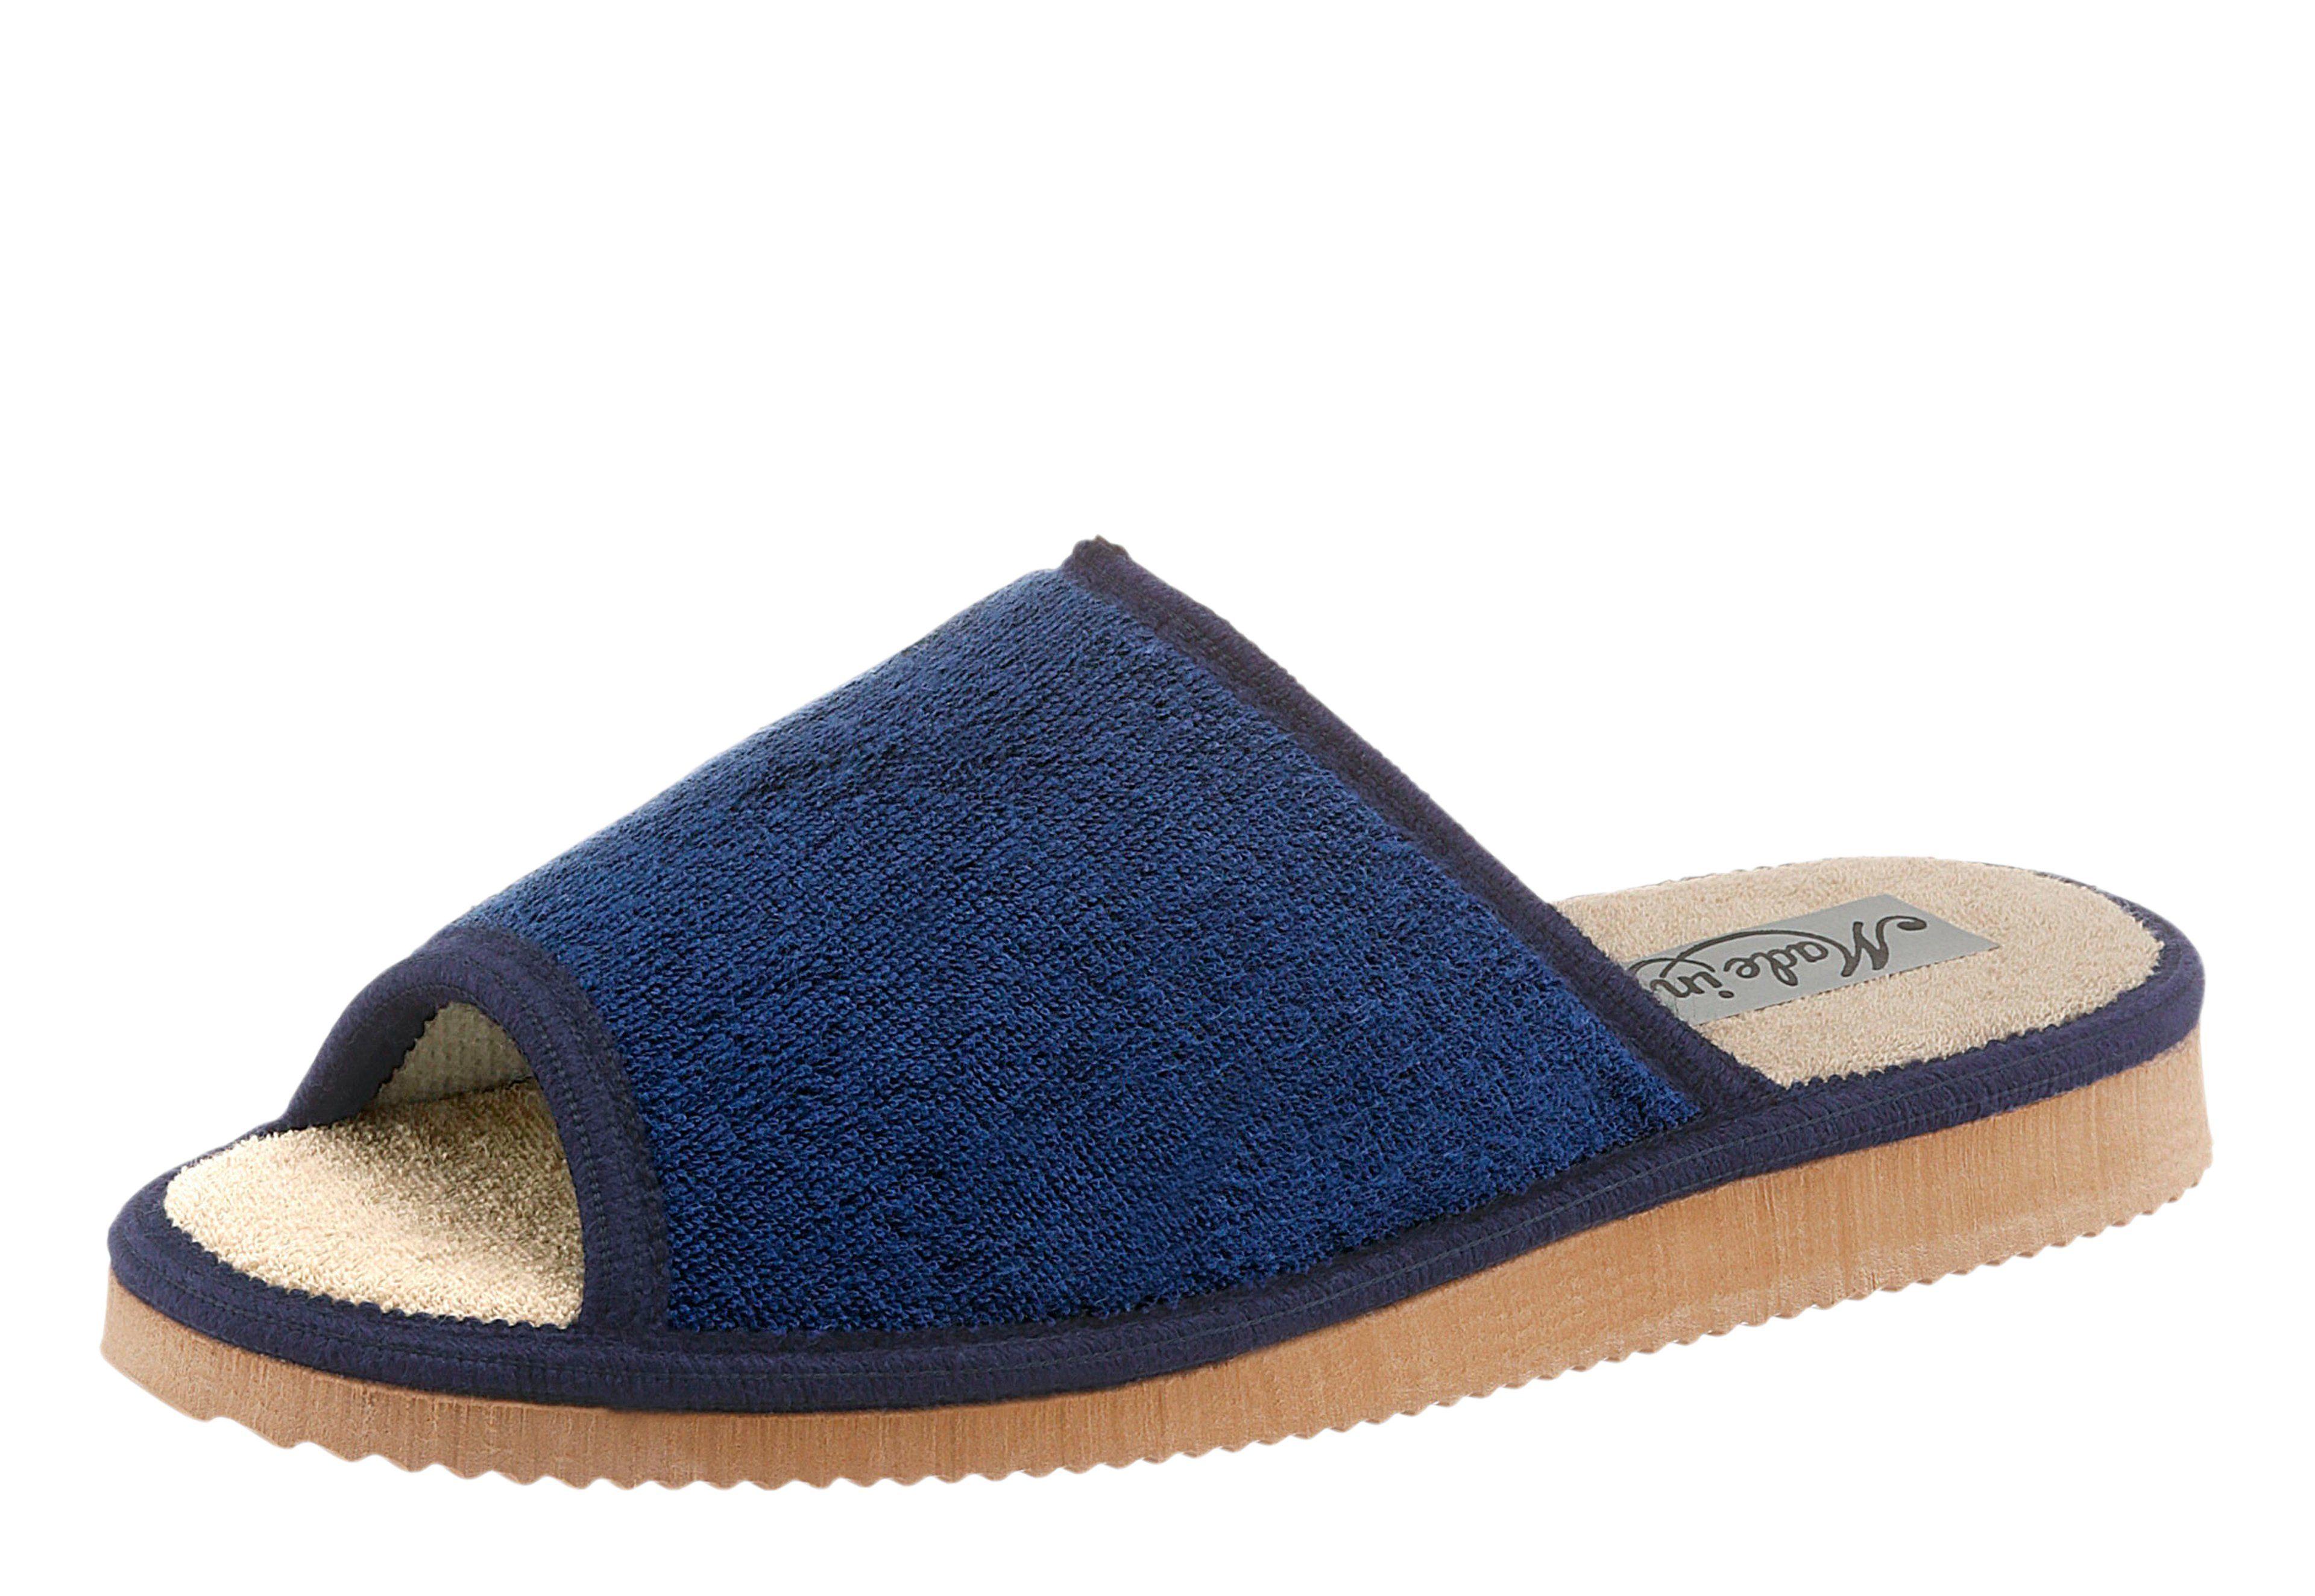 Classic Pantoffel mit rutschhemmender EVA-Laufsohle, blau, blau + marine